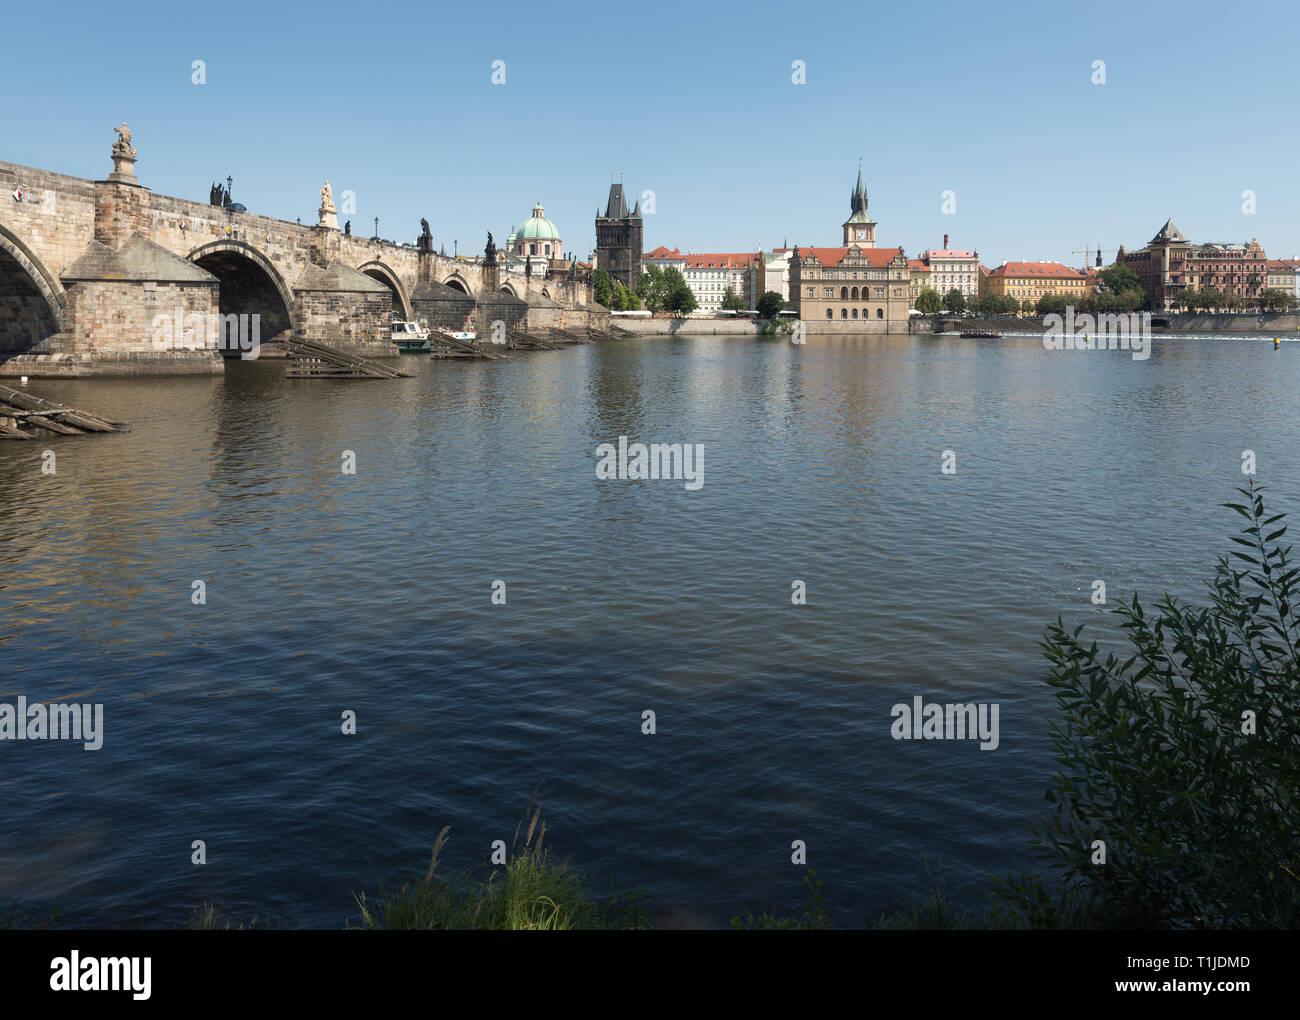 Prague: the Vltava river, Old Town - Stock Image